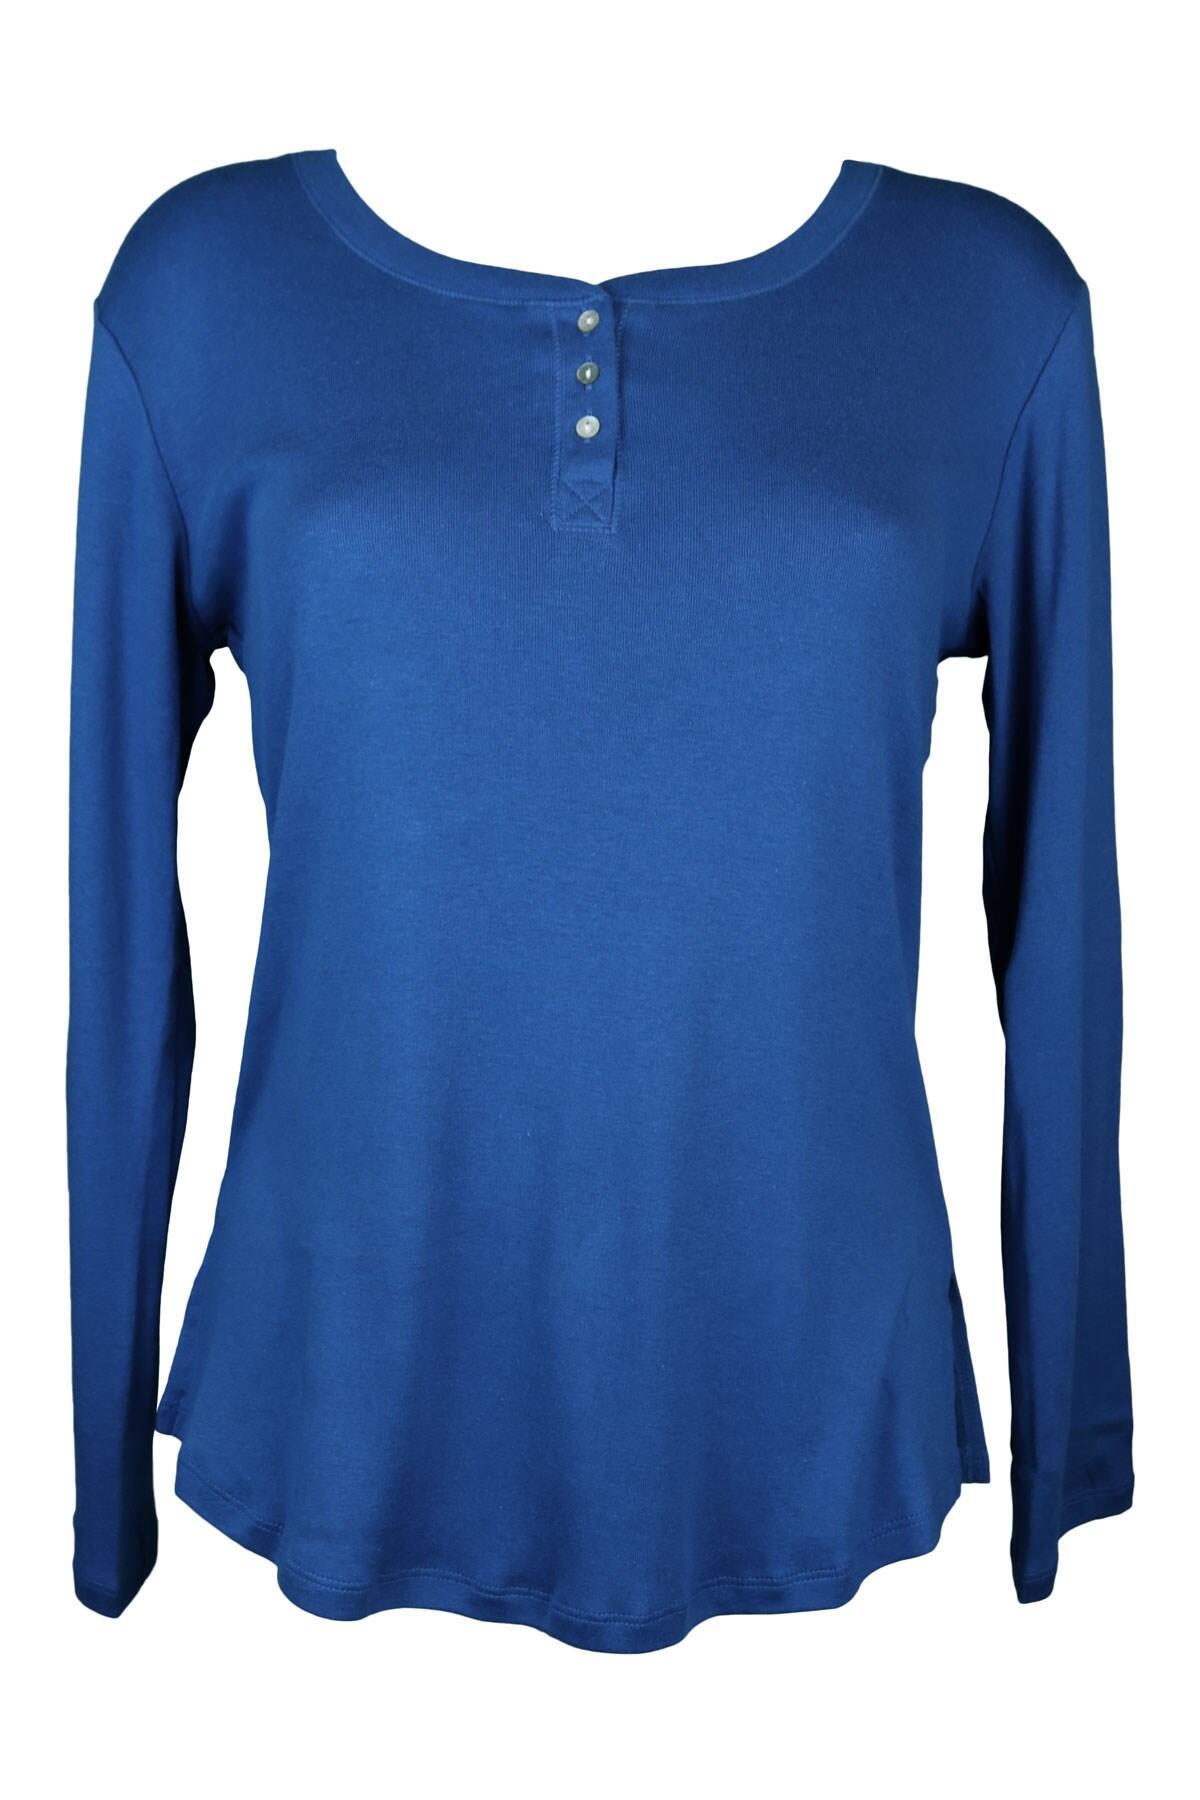 Magenta Madness Knit Top - Blue